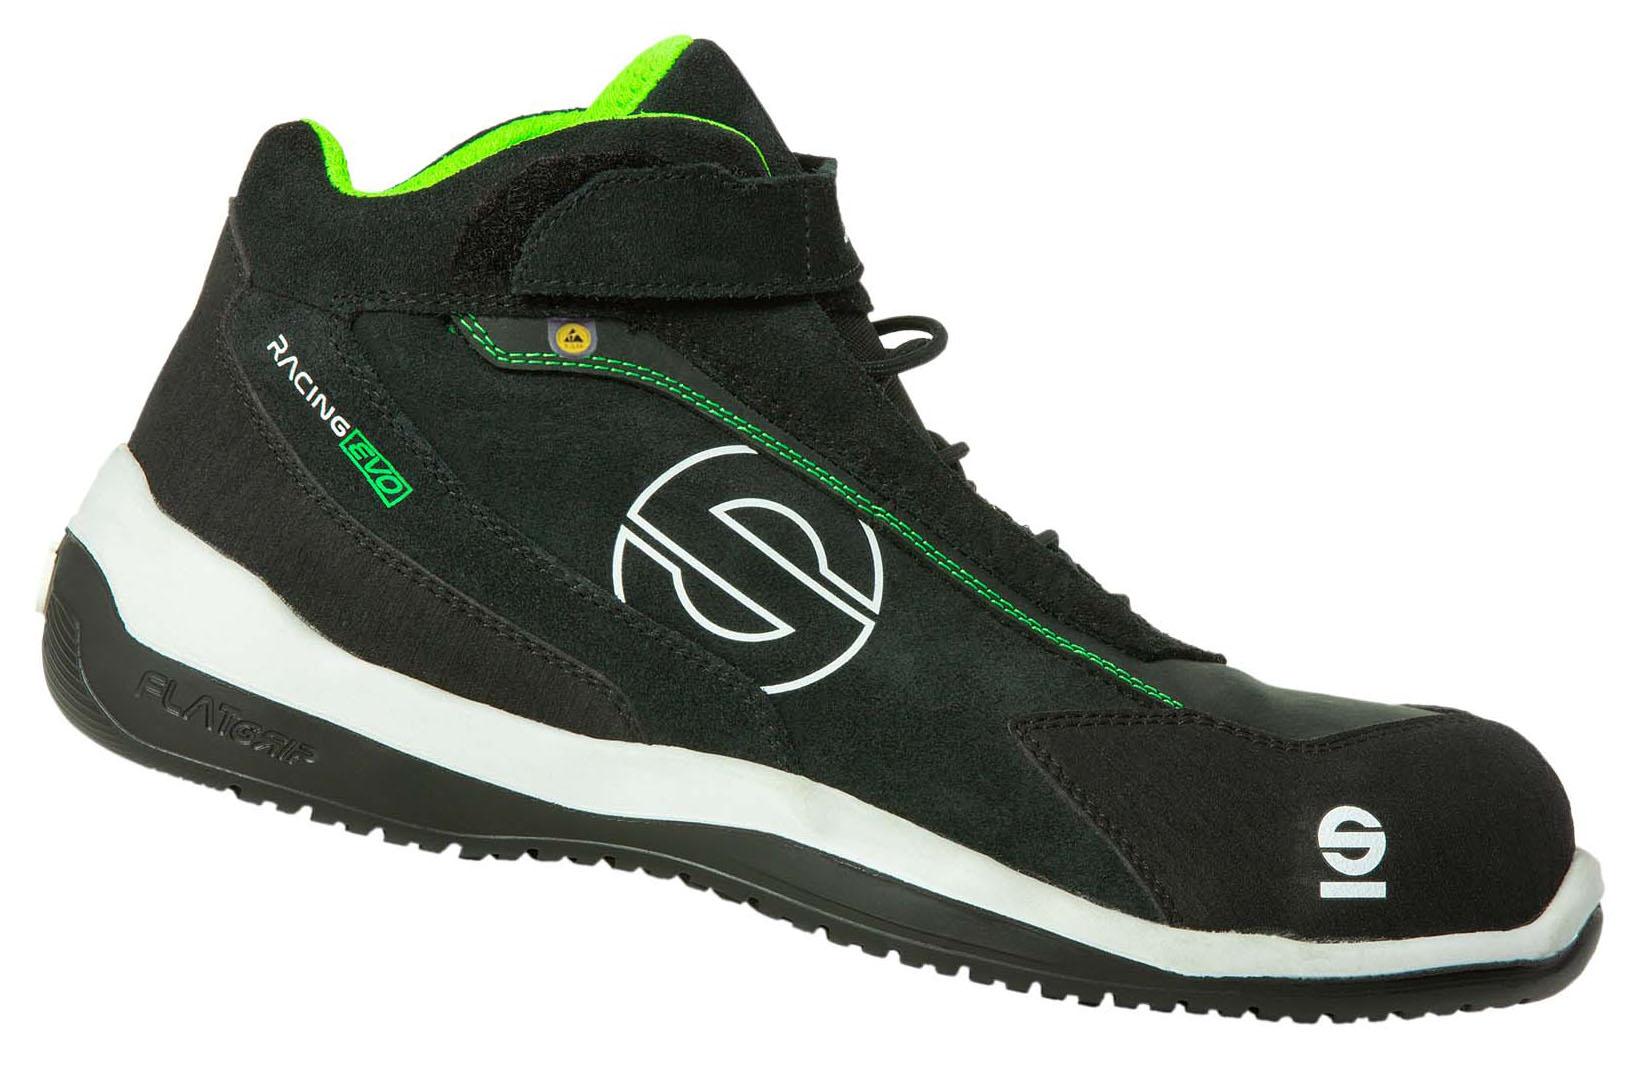 "Sparco-Stiefel niedrig ""RACING EVO"" S3 black-green 46"